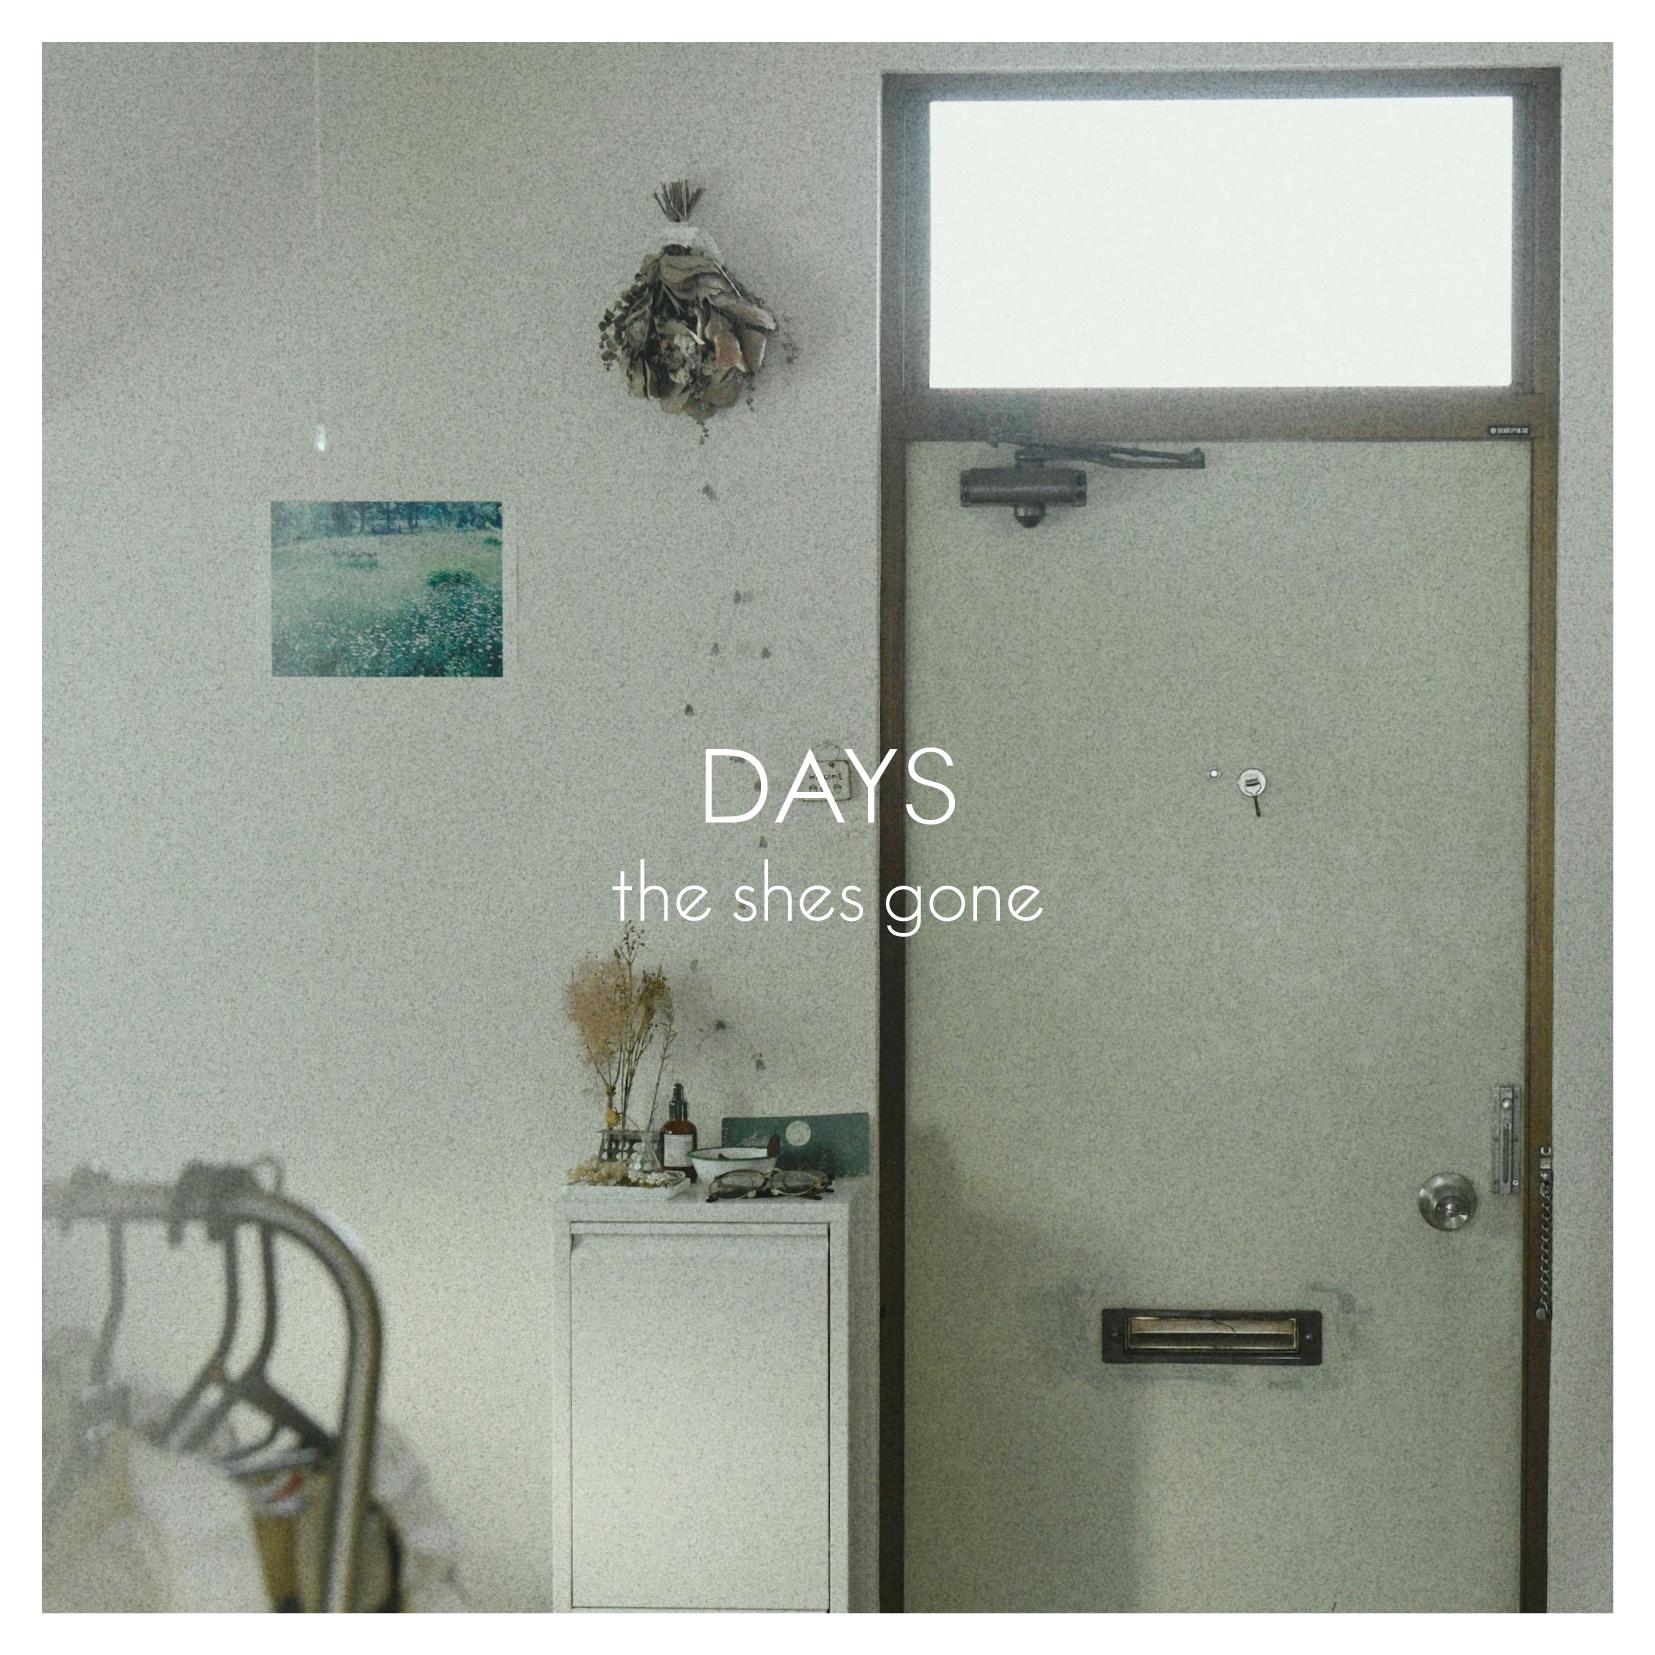 shesgone_days_hyou1_h1